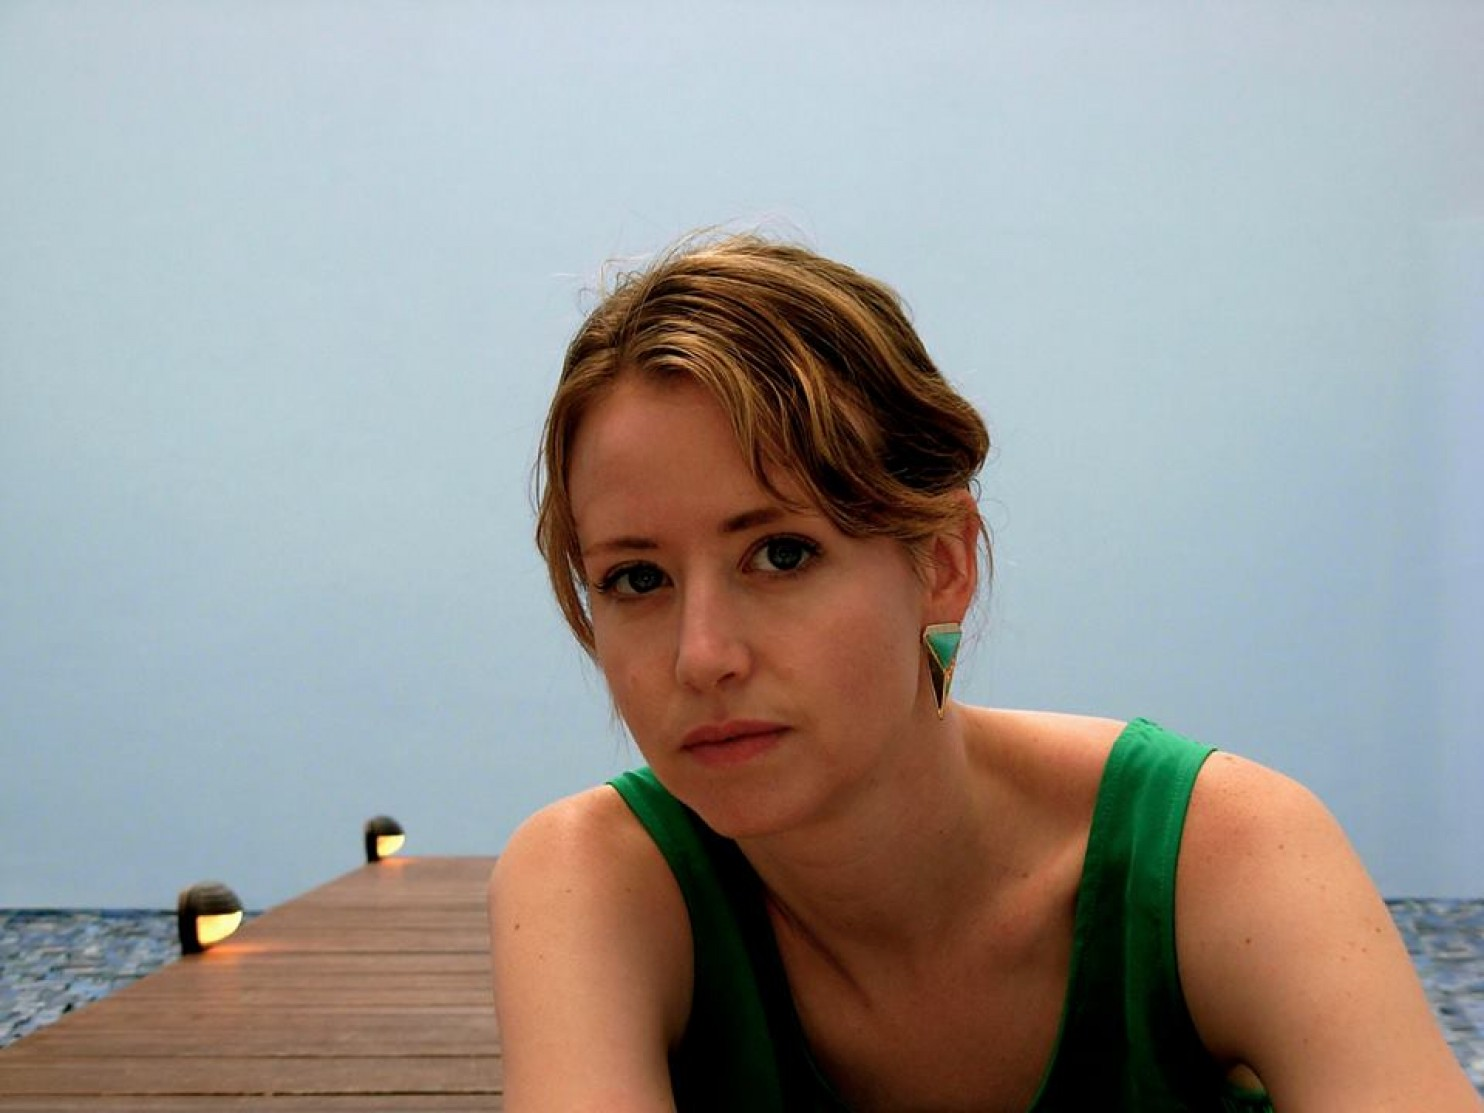 Laura van den Berg - Fotoğraf: Paul Yoon